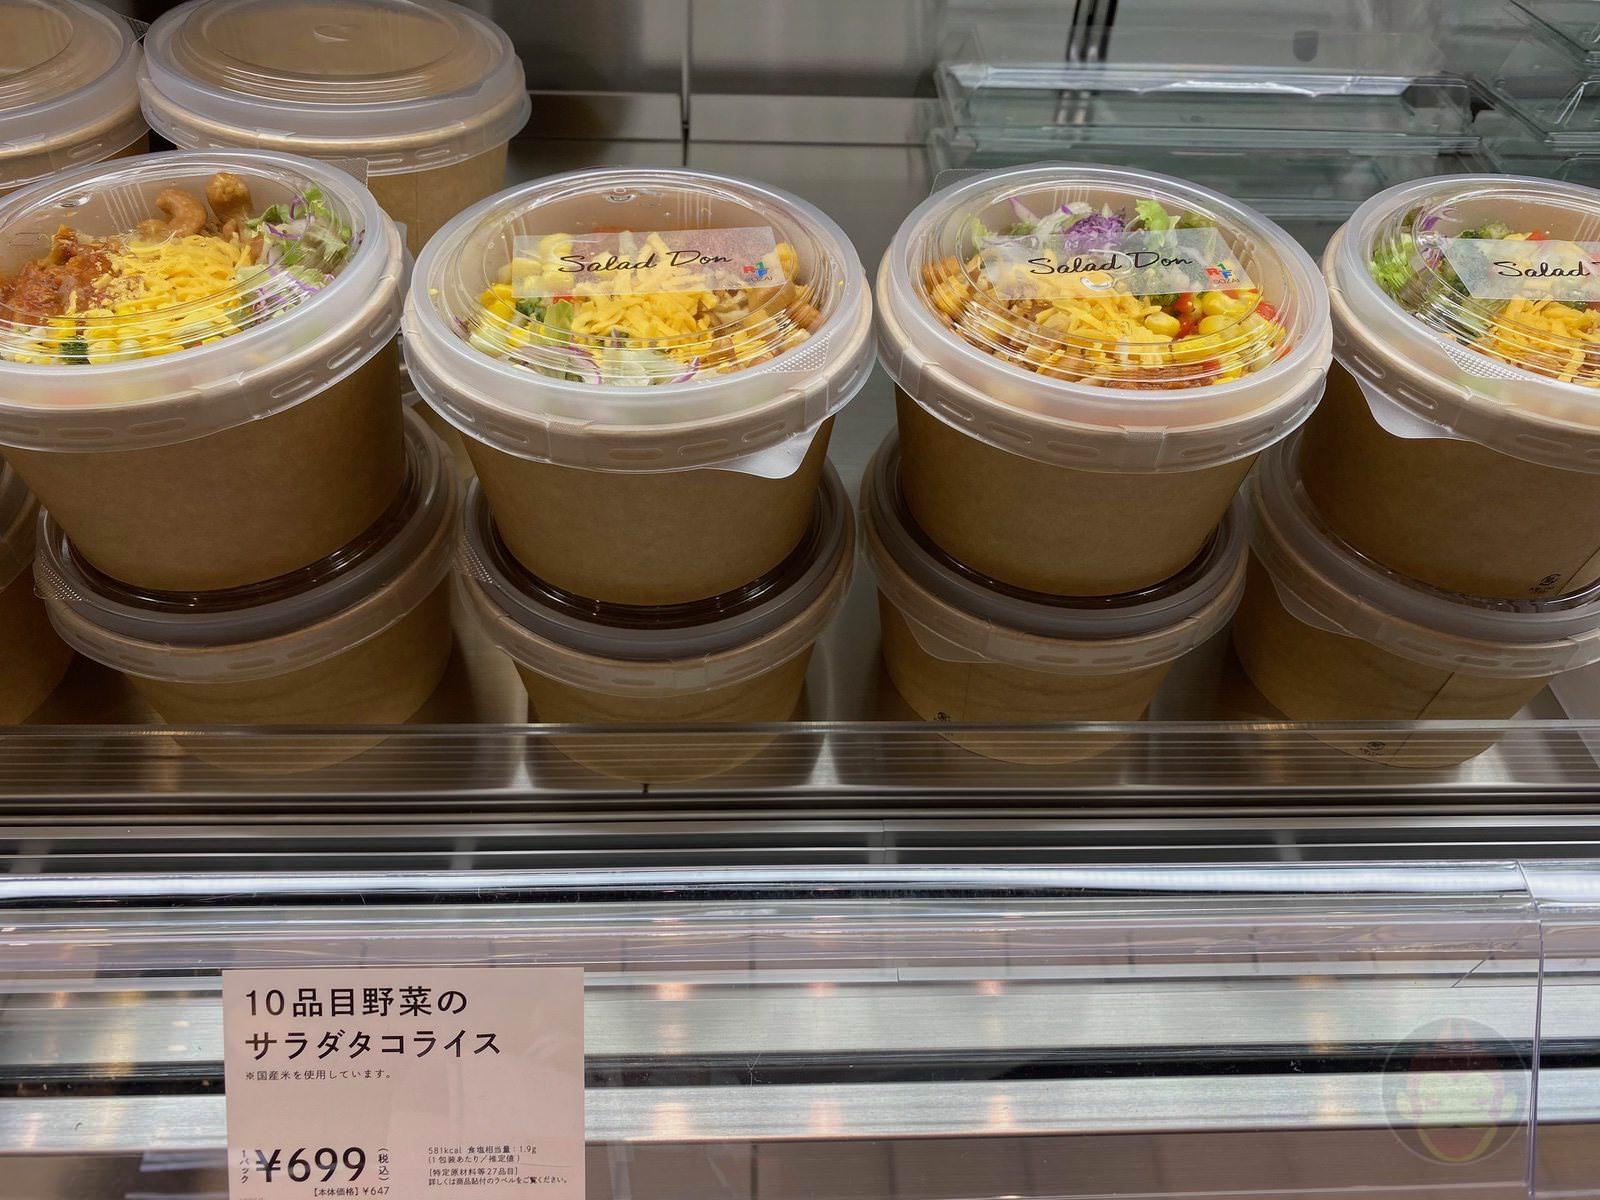 Shibuya-Scramble-Square-Food-I-Ate-138.jpeg